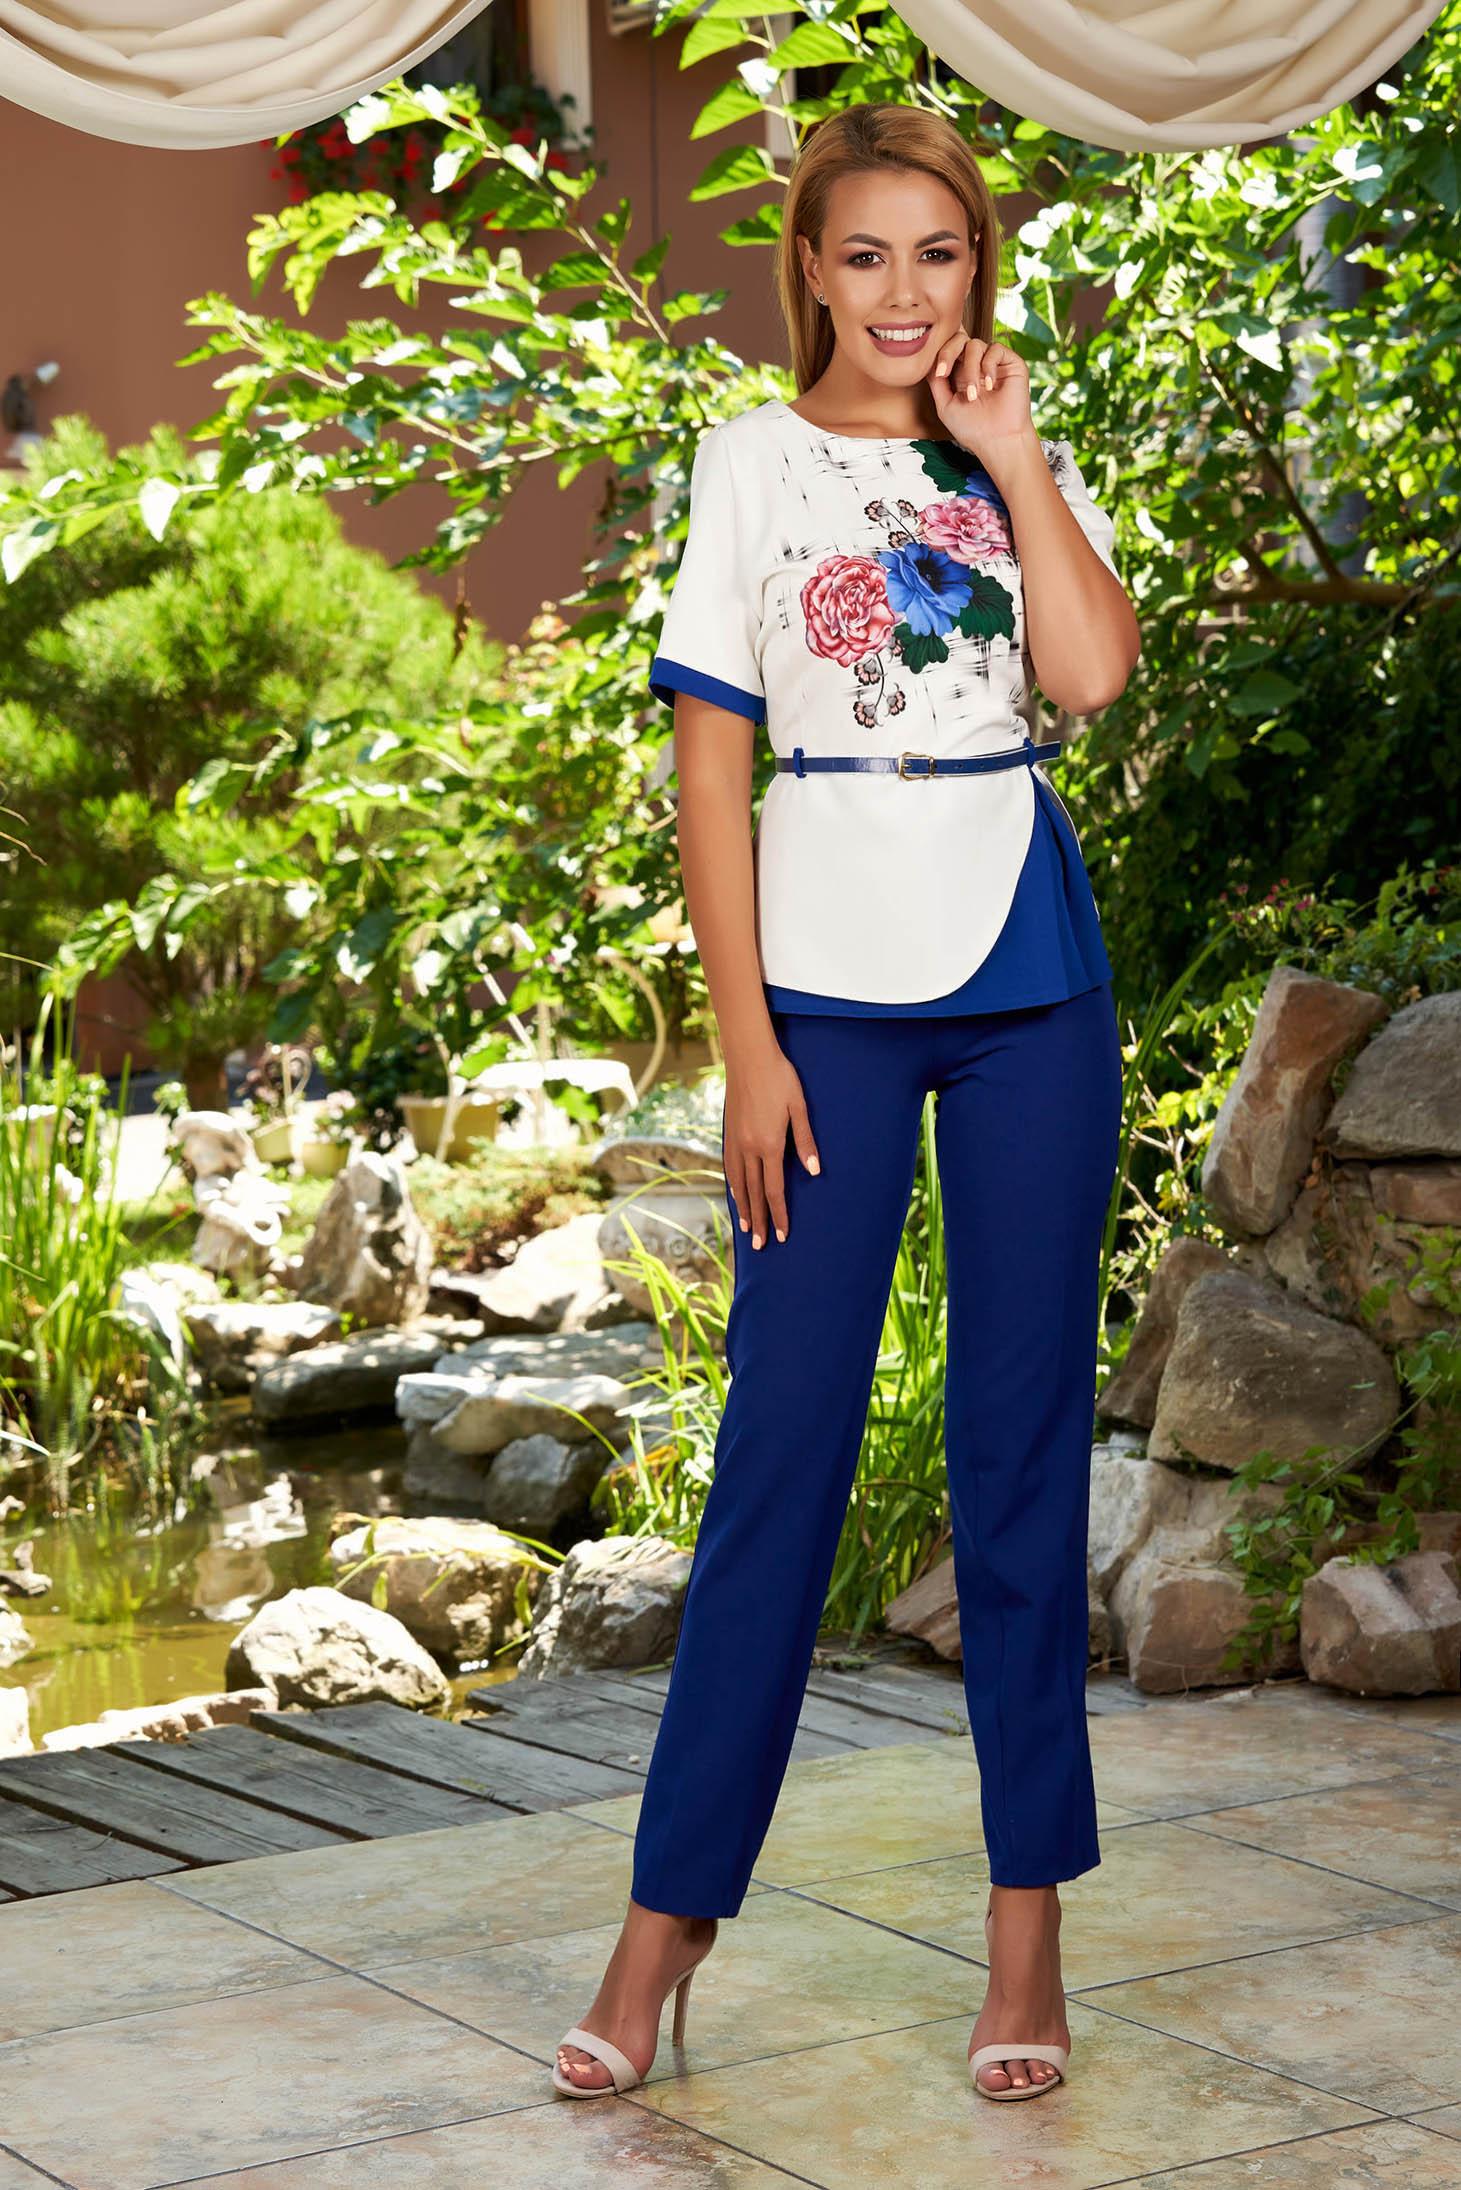 Compleu albastru elegant din 2 piese cu pantaloni cu accesoriu tip curea si imprimeu floral